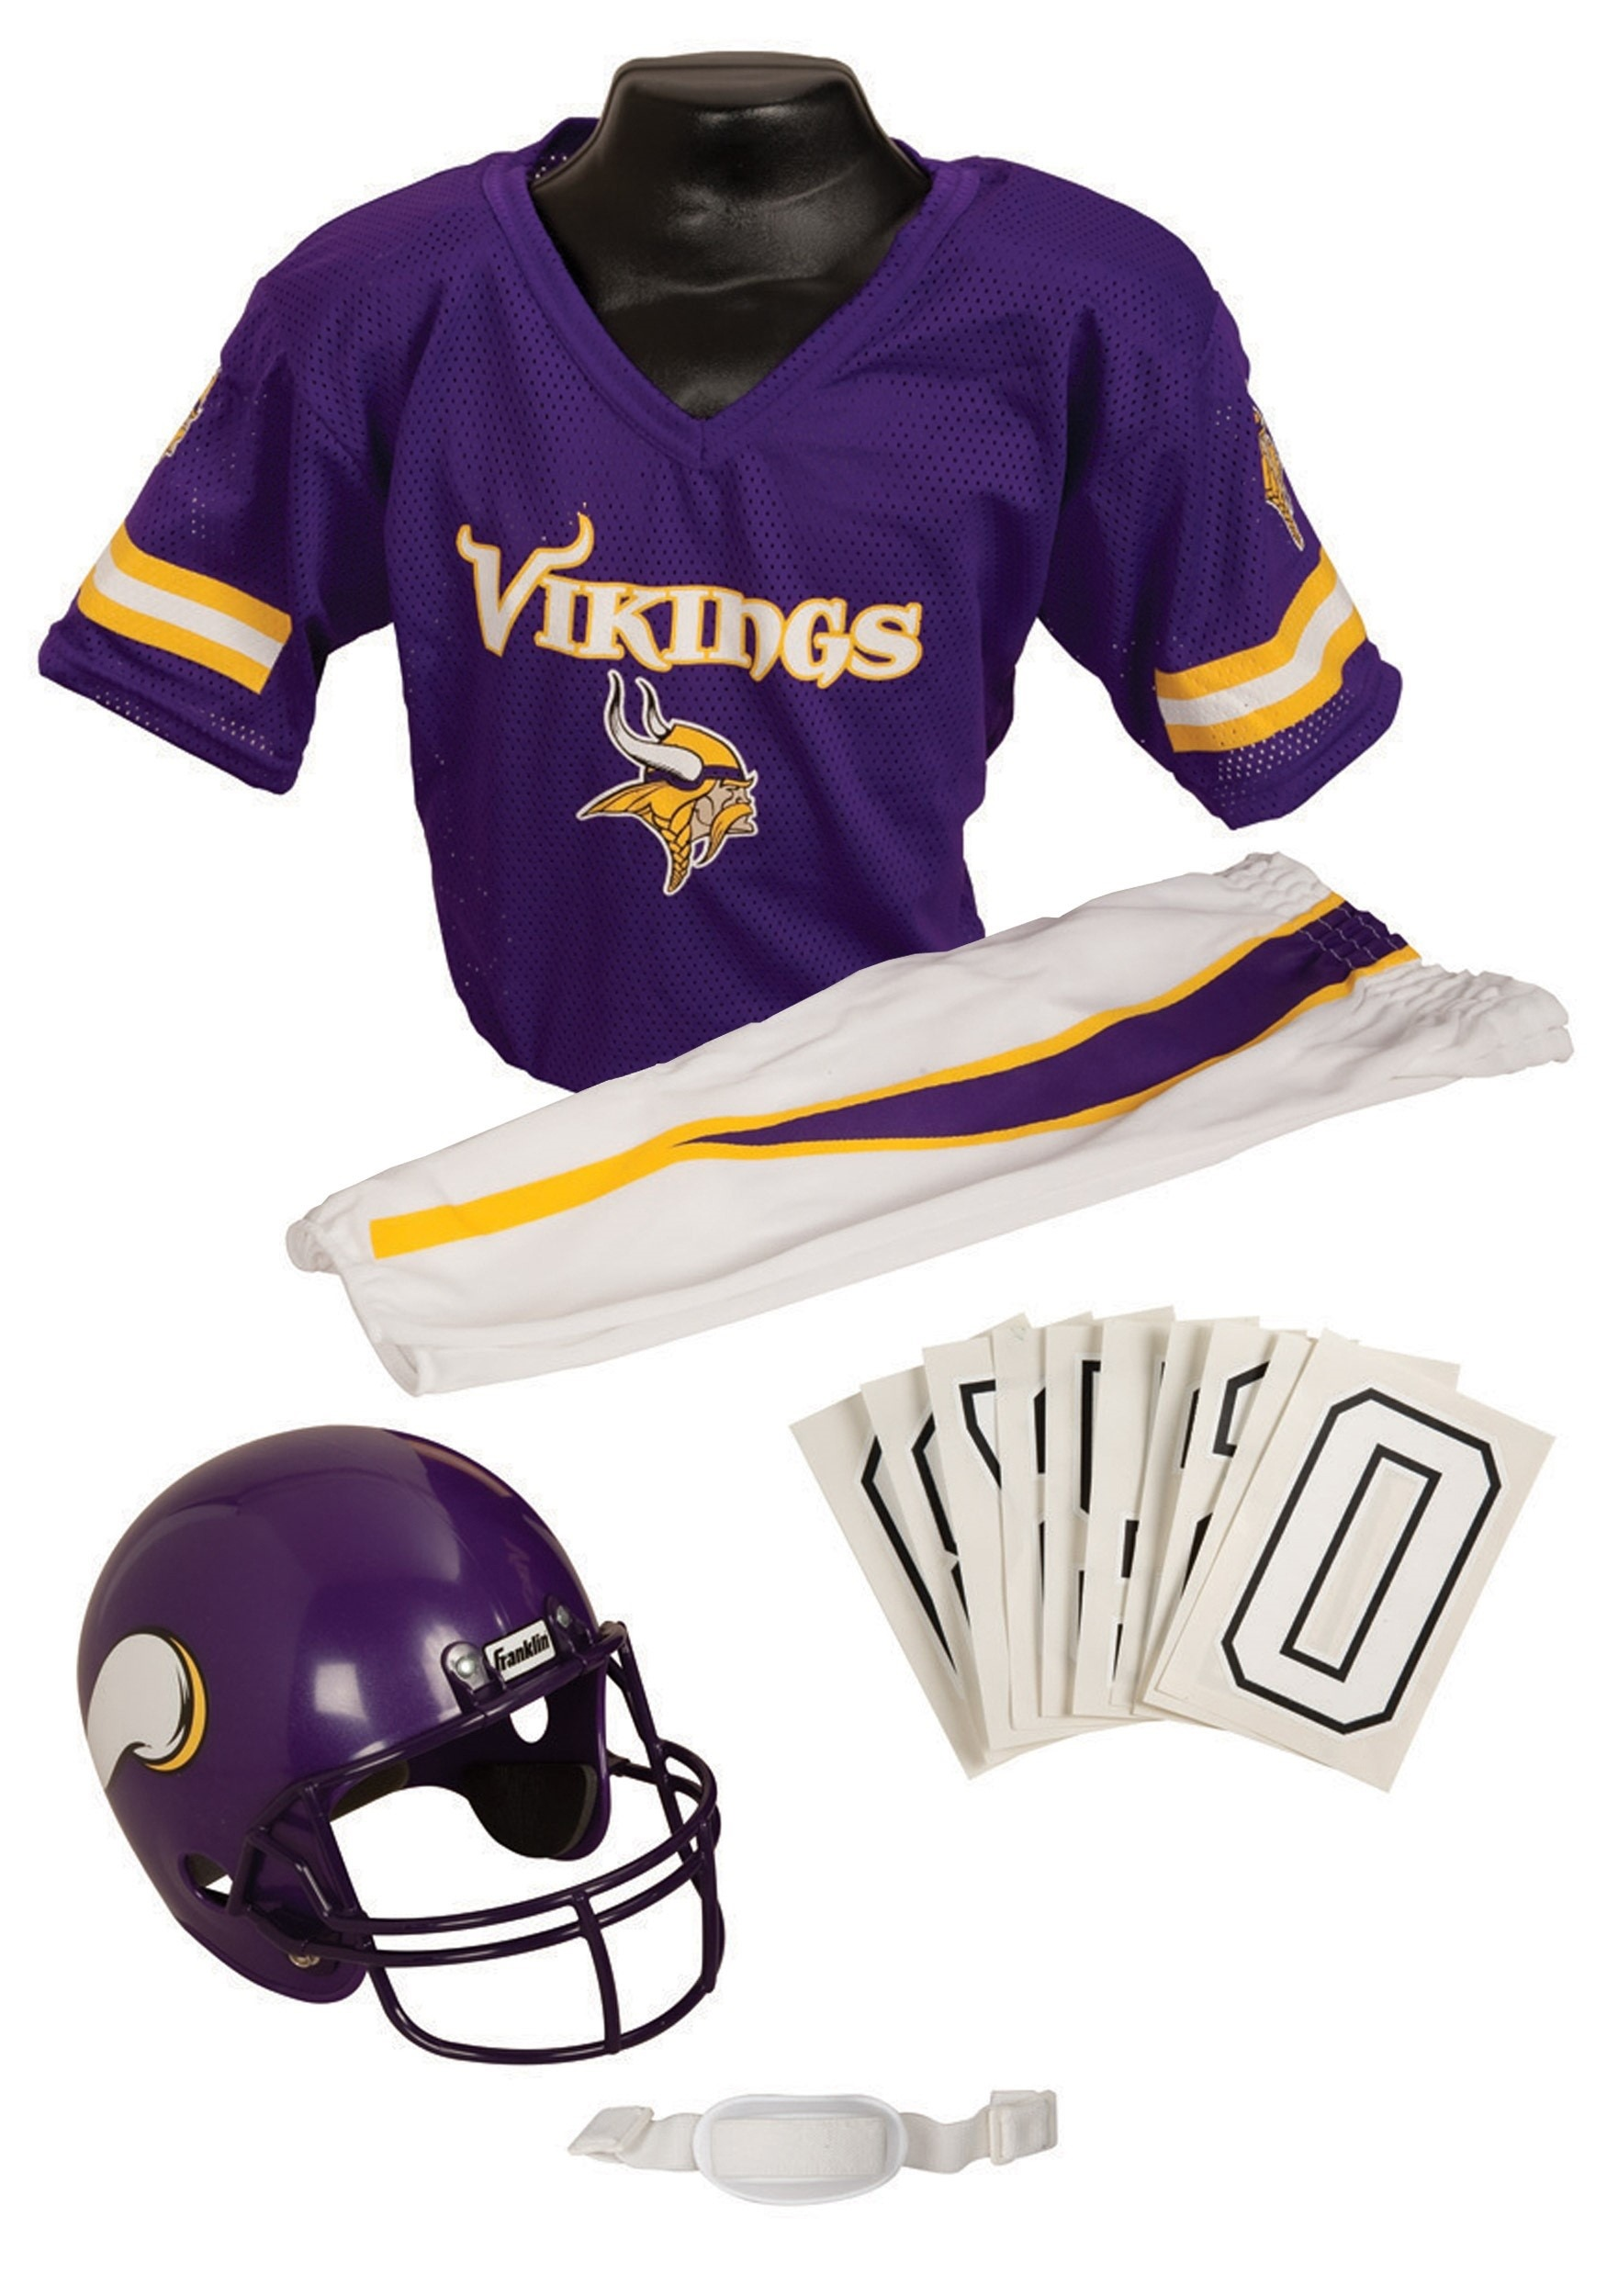 a45e1d524 NFL Vikings Player Costume - Minnesota Vikings Football Uniform Costume